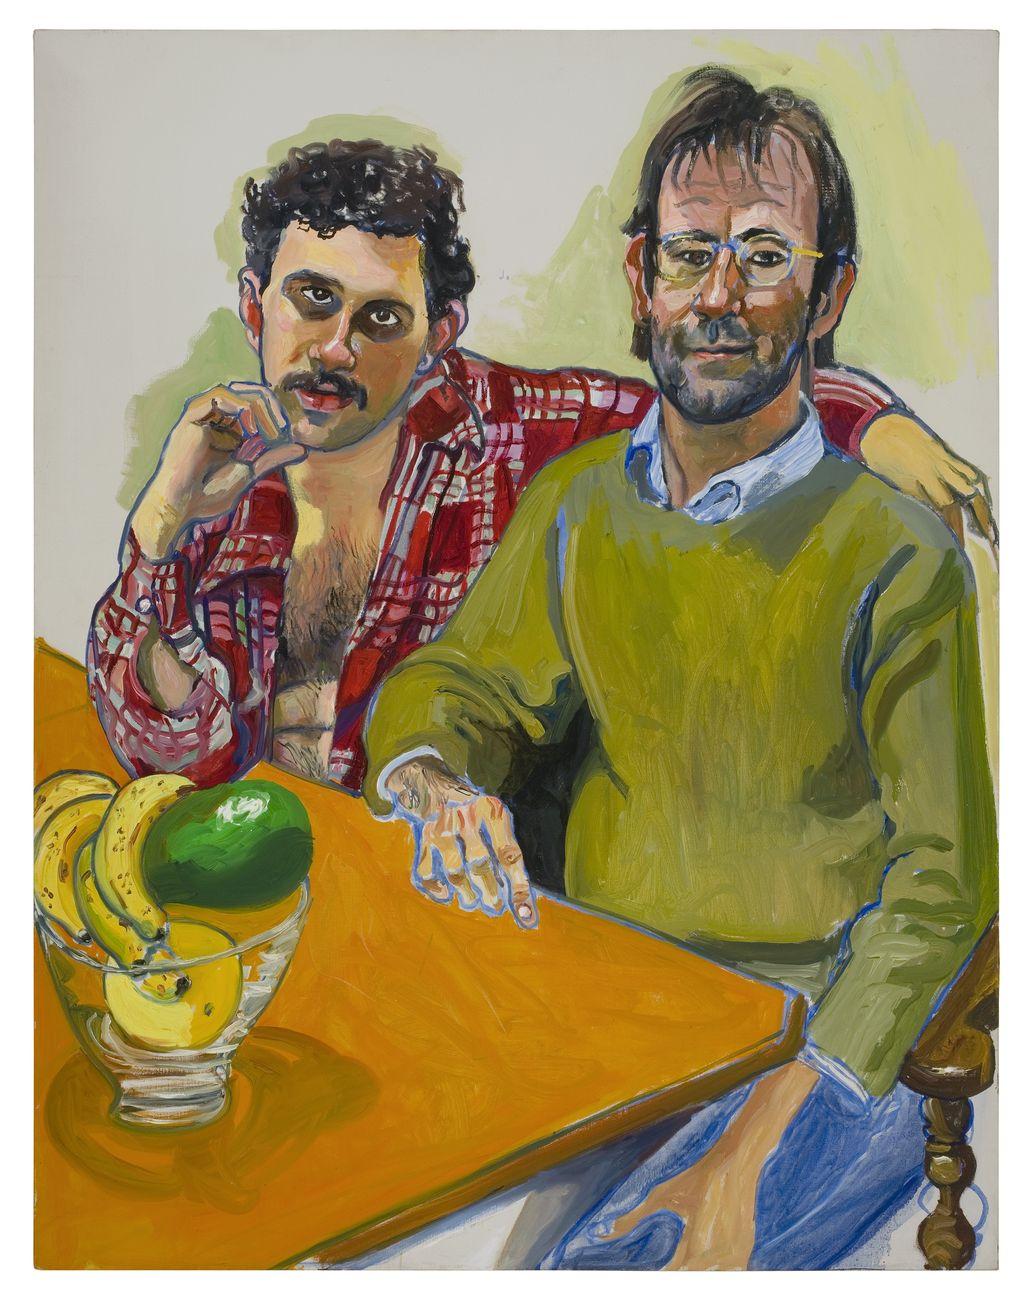 Alice Neel, Geoffrey Hendricks and Brian, 1978, olio su tela, 118,7 × 93,3 cm. San Francisco Museum of Modern Art © The Estate of Alice Neel, Bilbao, 2021